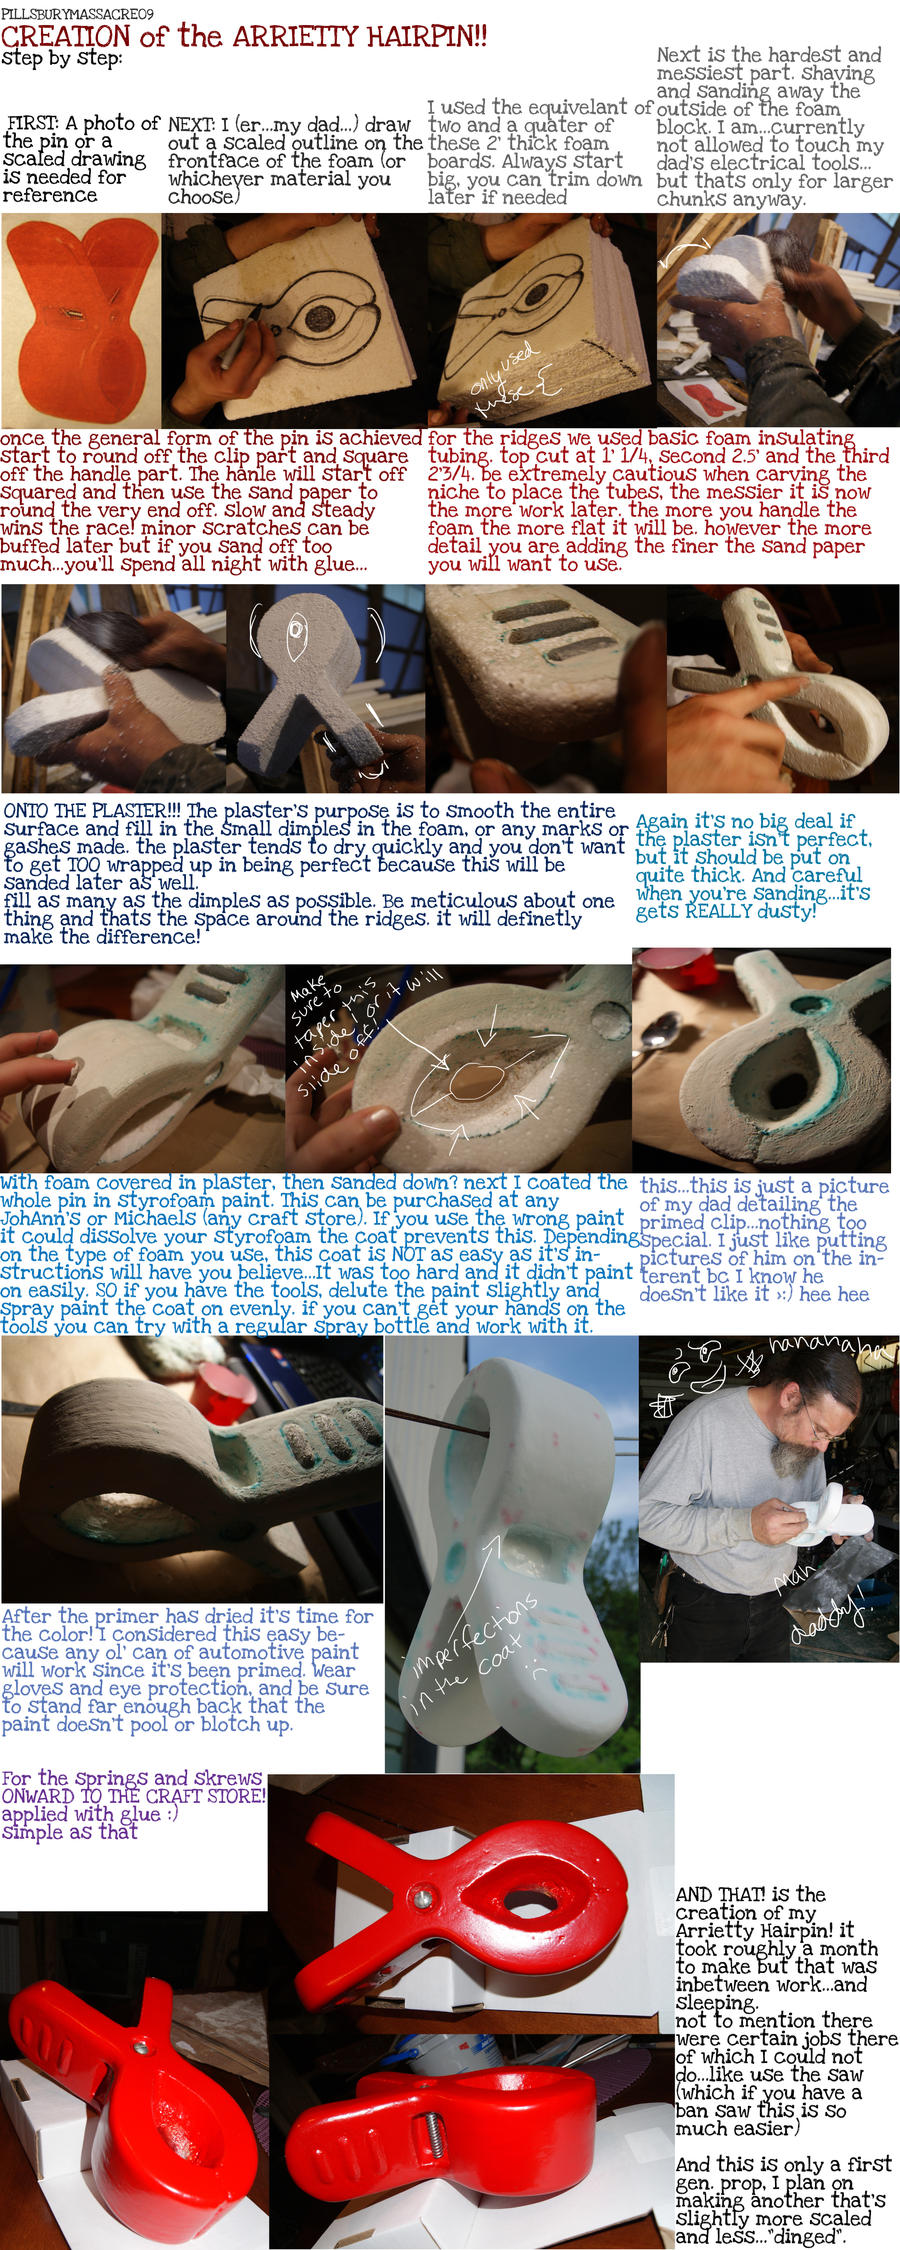 Arrietty HairPin Creation by PillsburyMassacre09